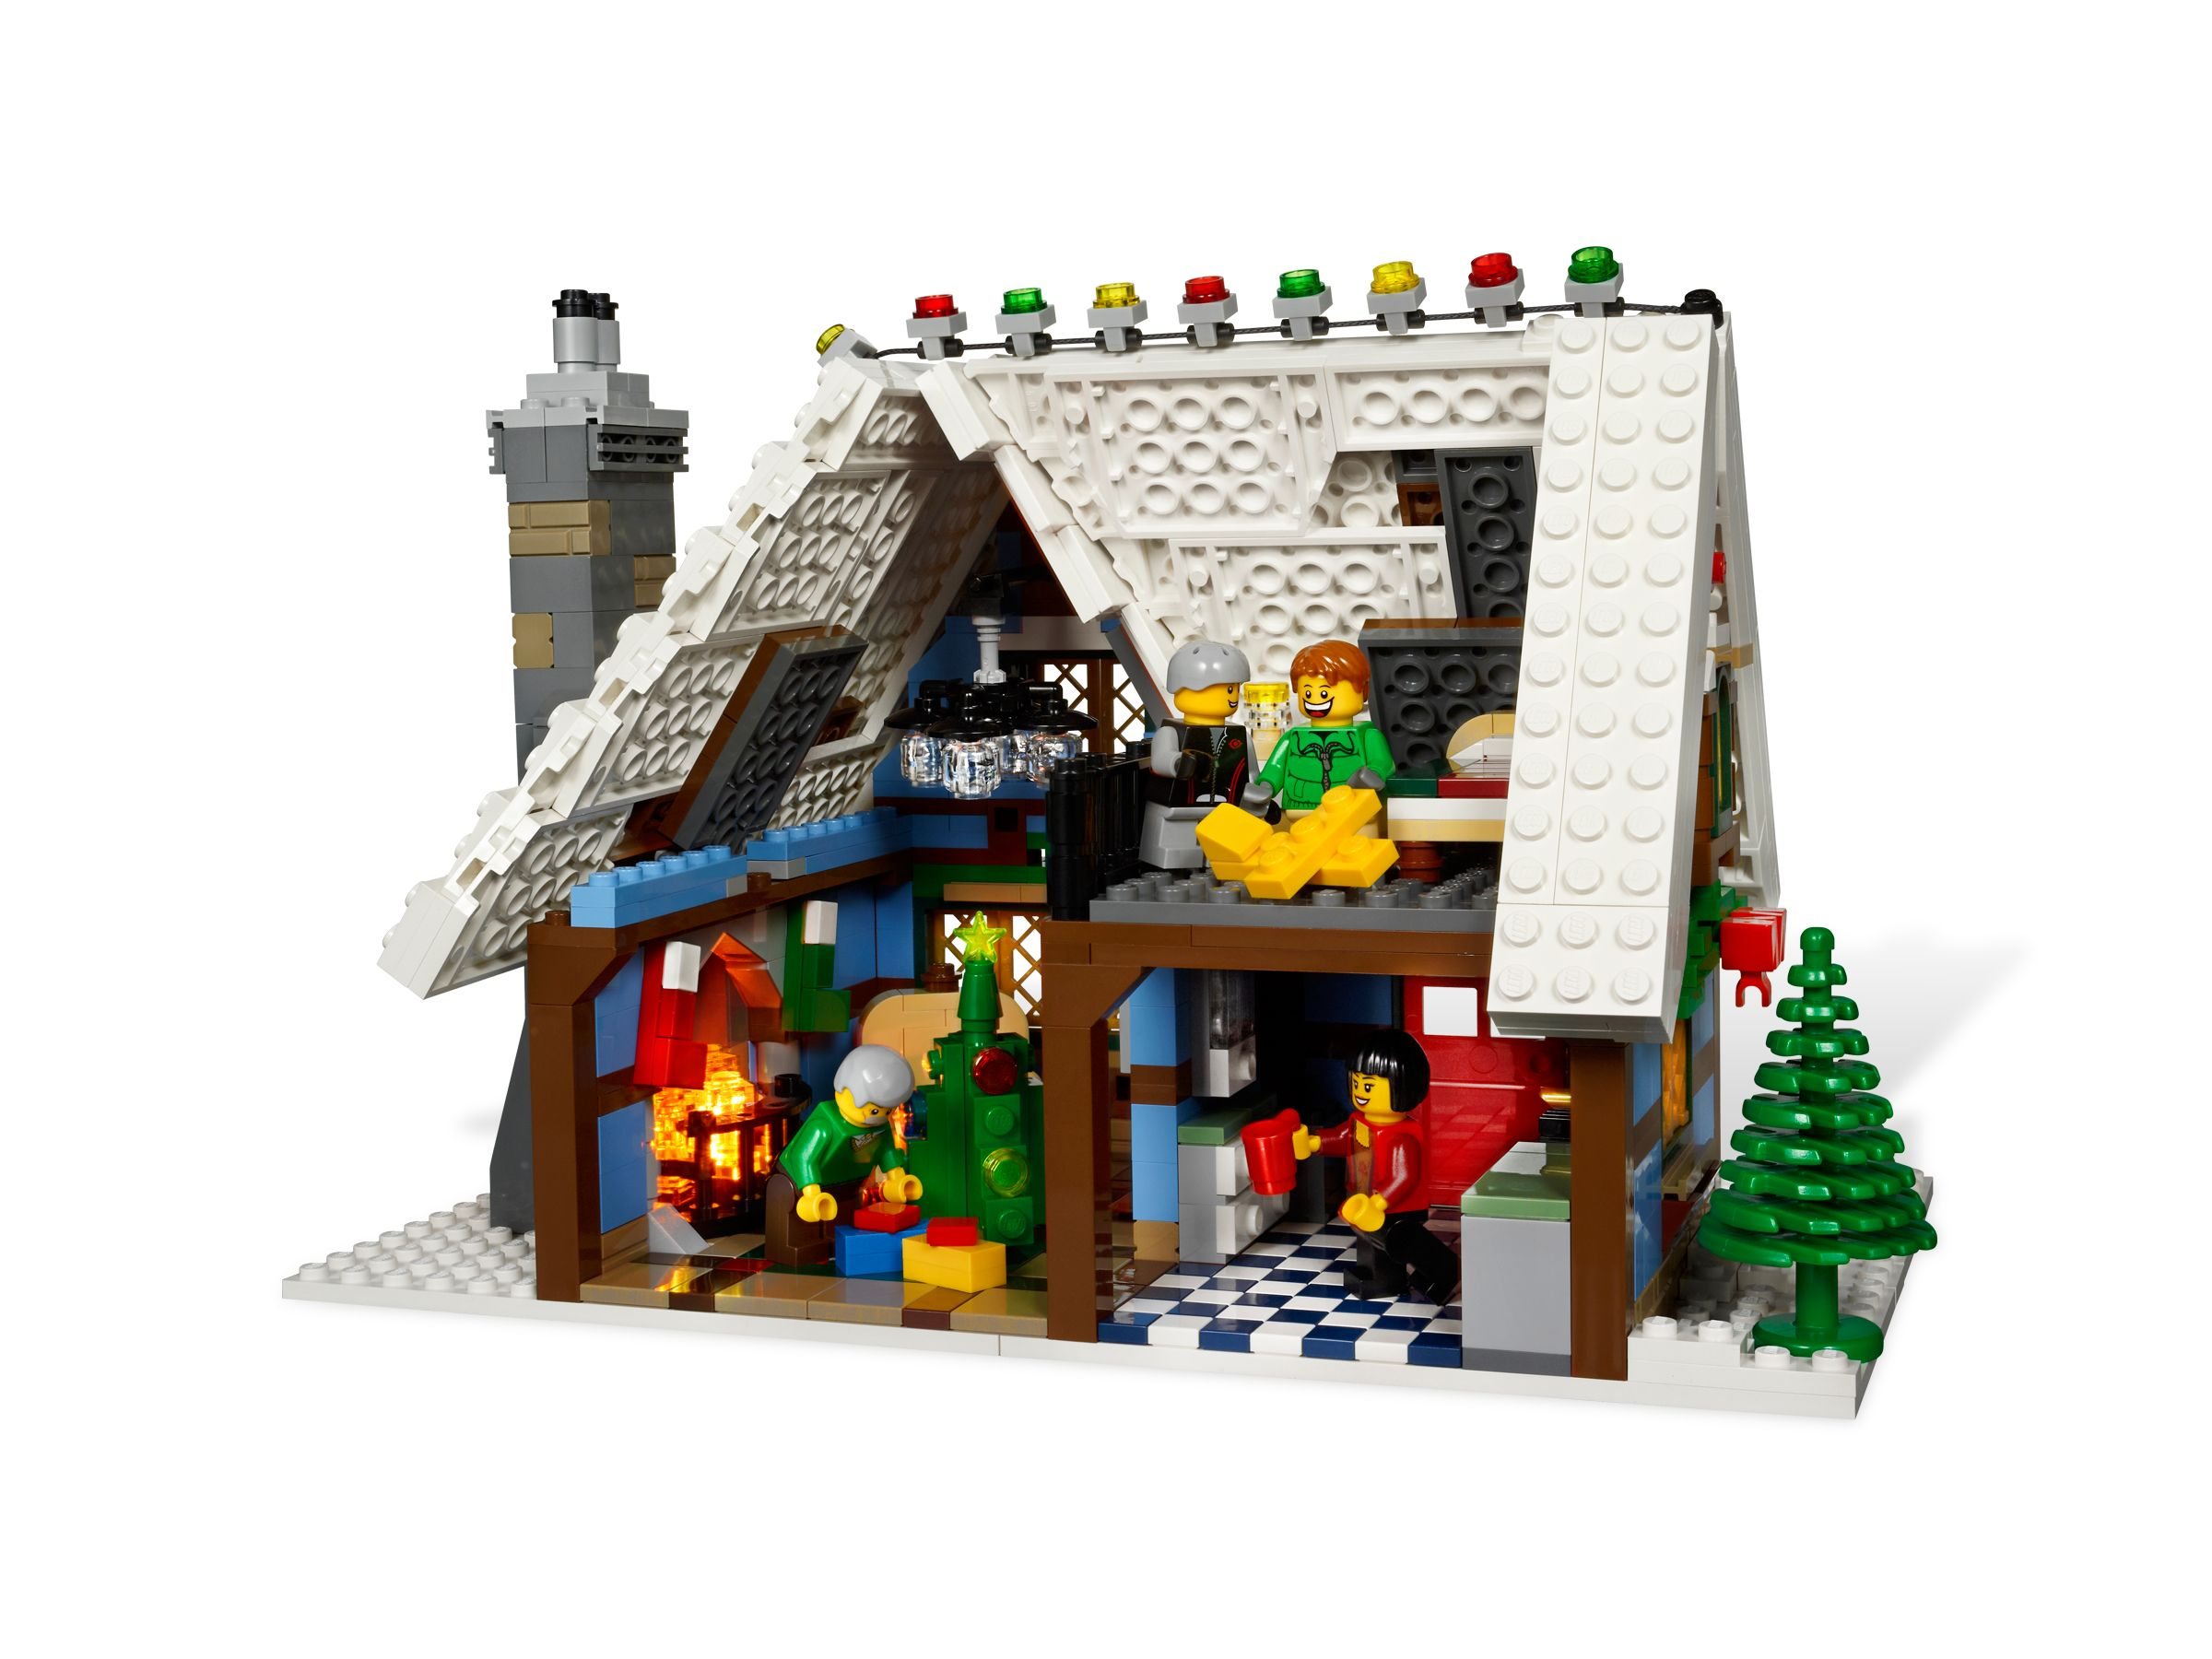 lego winter village cottage 2012 toys n bricks Stant 10229 LEGO Creator Winter Cottage